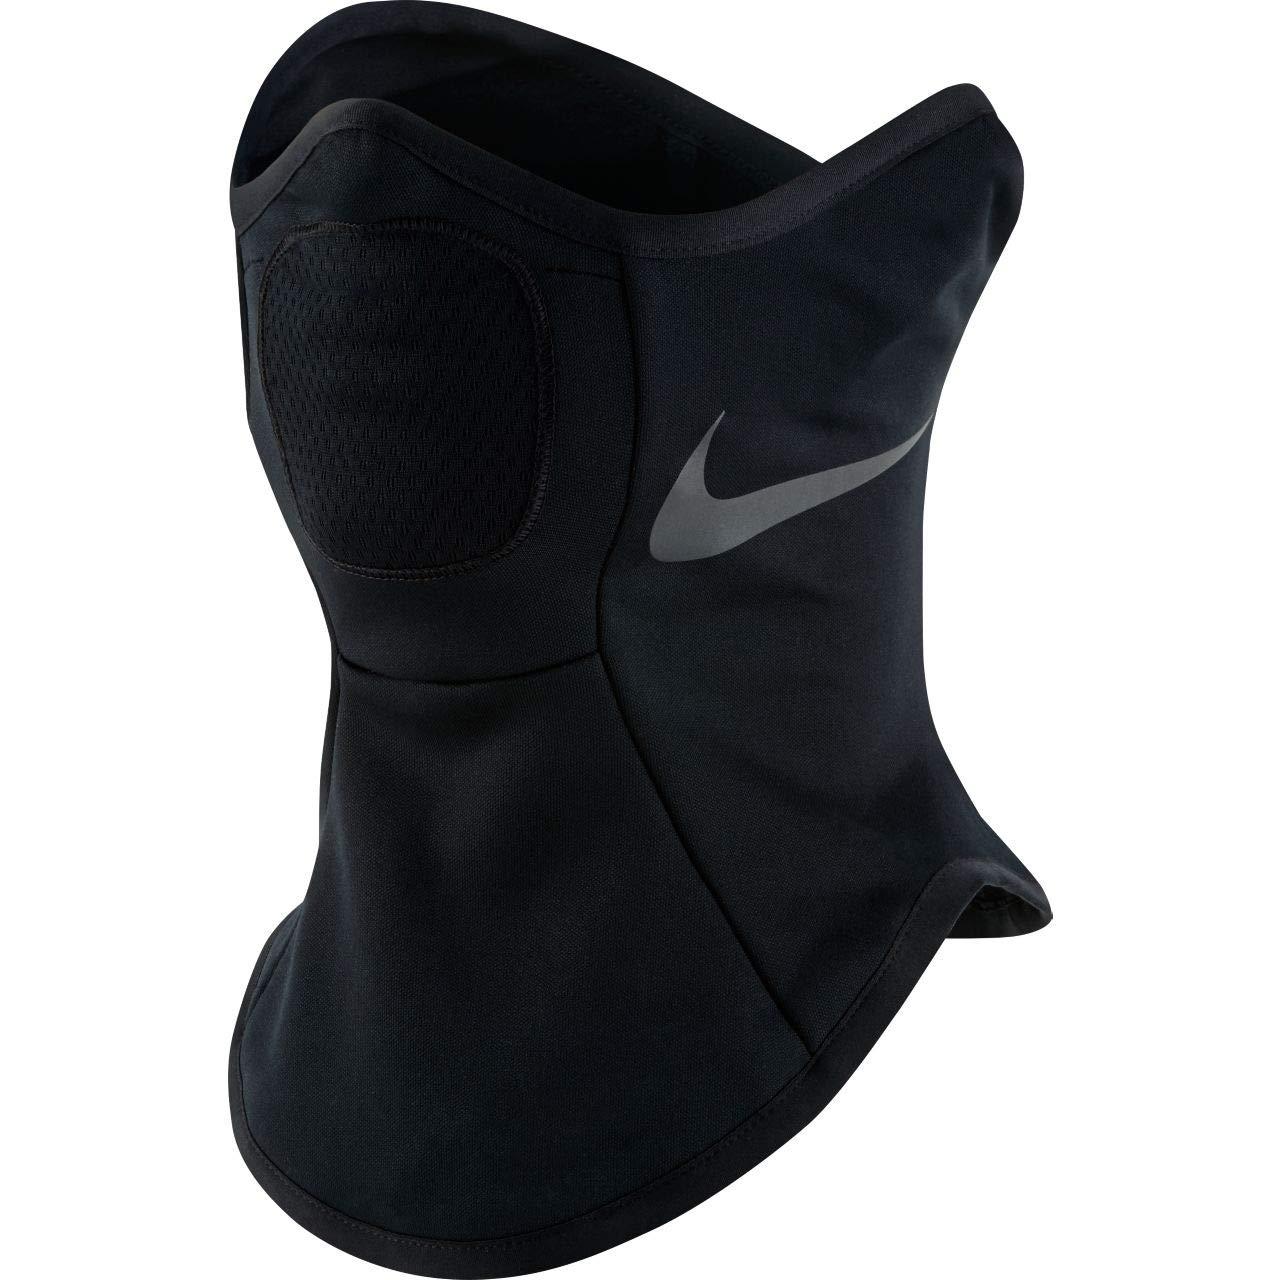 NIKE Squad Soccer Snood Black/Gray Unisex (L/XL) by Nike